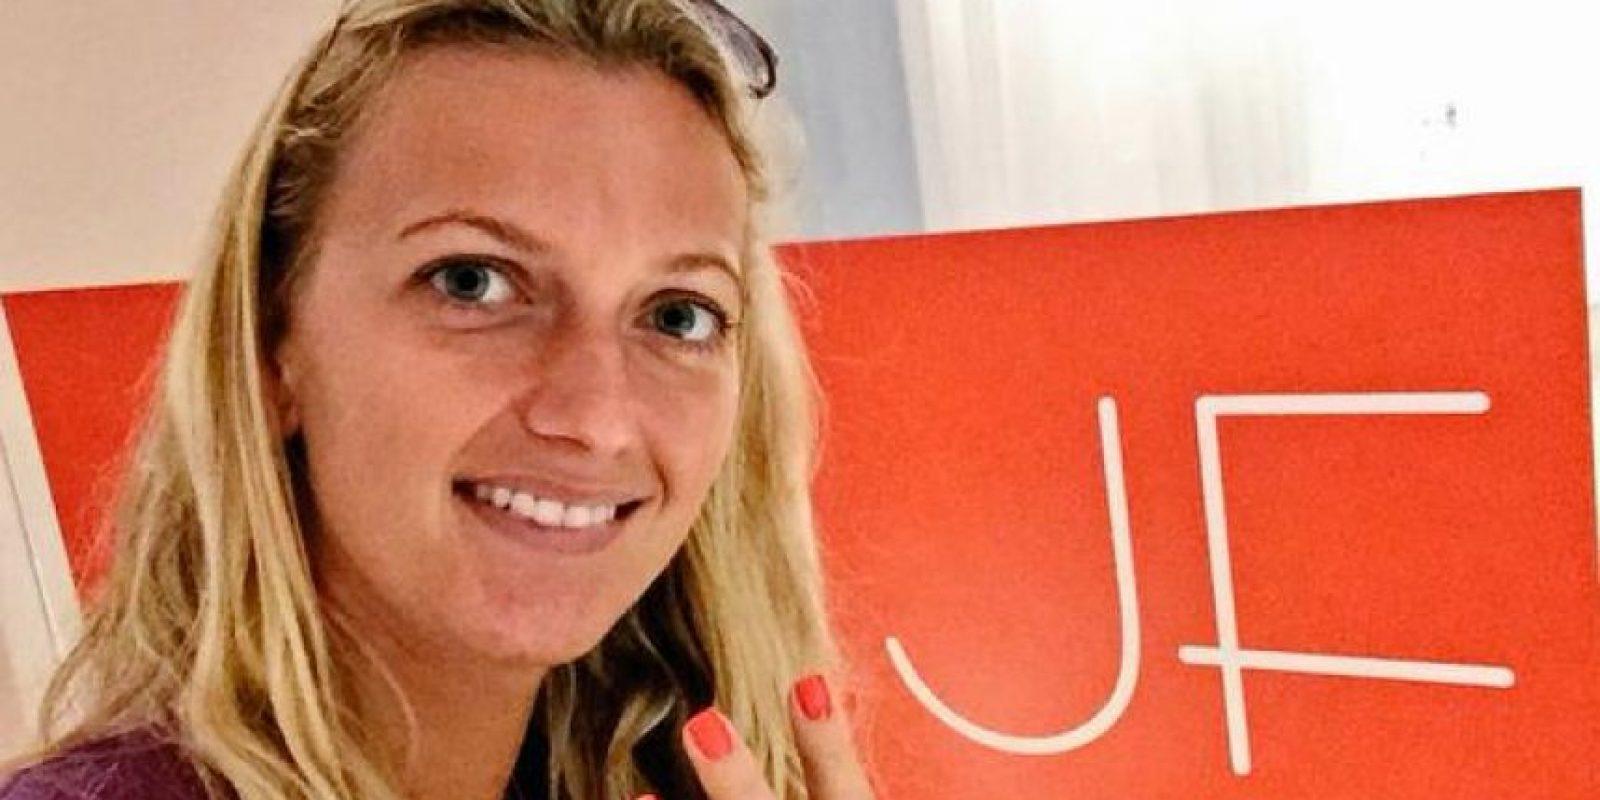 La checa Petra Kvitova, número 4 del mundo, aprovechó su estancia en Nueva York para arreglarse las uñas. Foto:Vía twitter.com/Petra_Kvitova